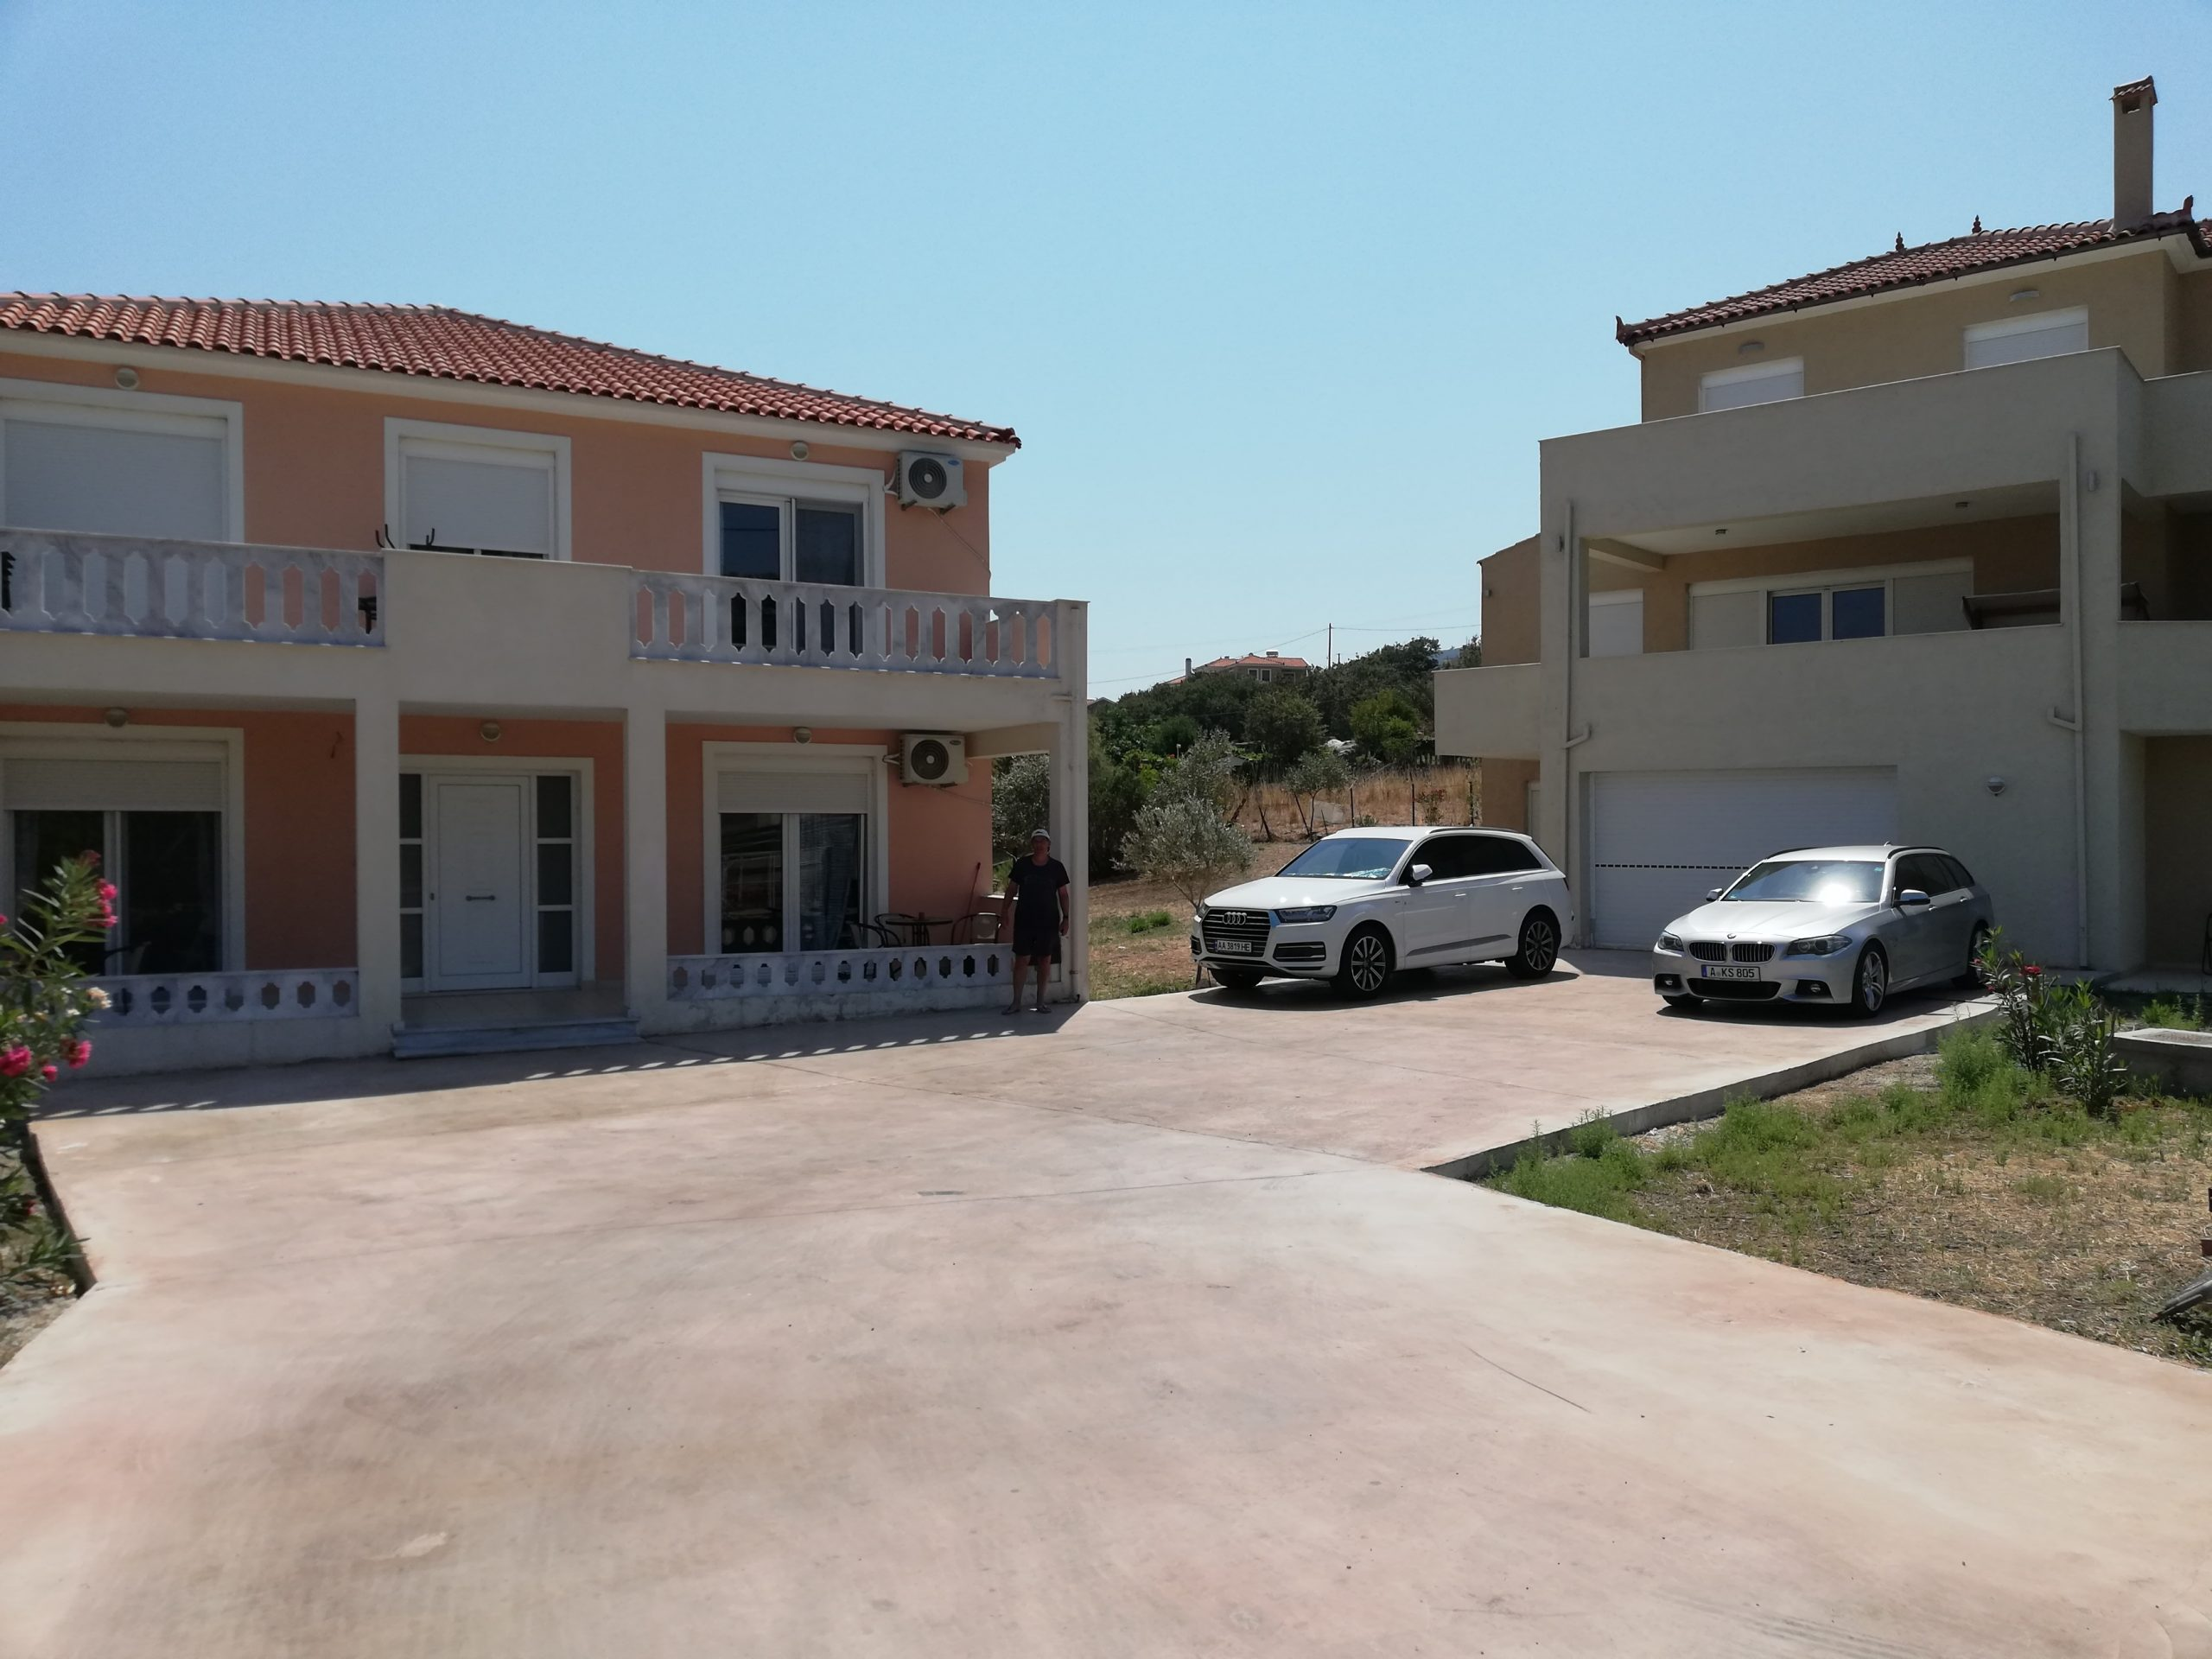 Haus am Meer zu vermieten